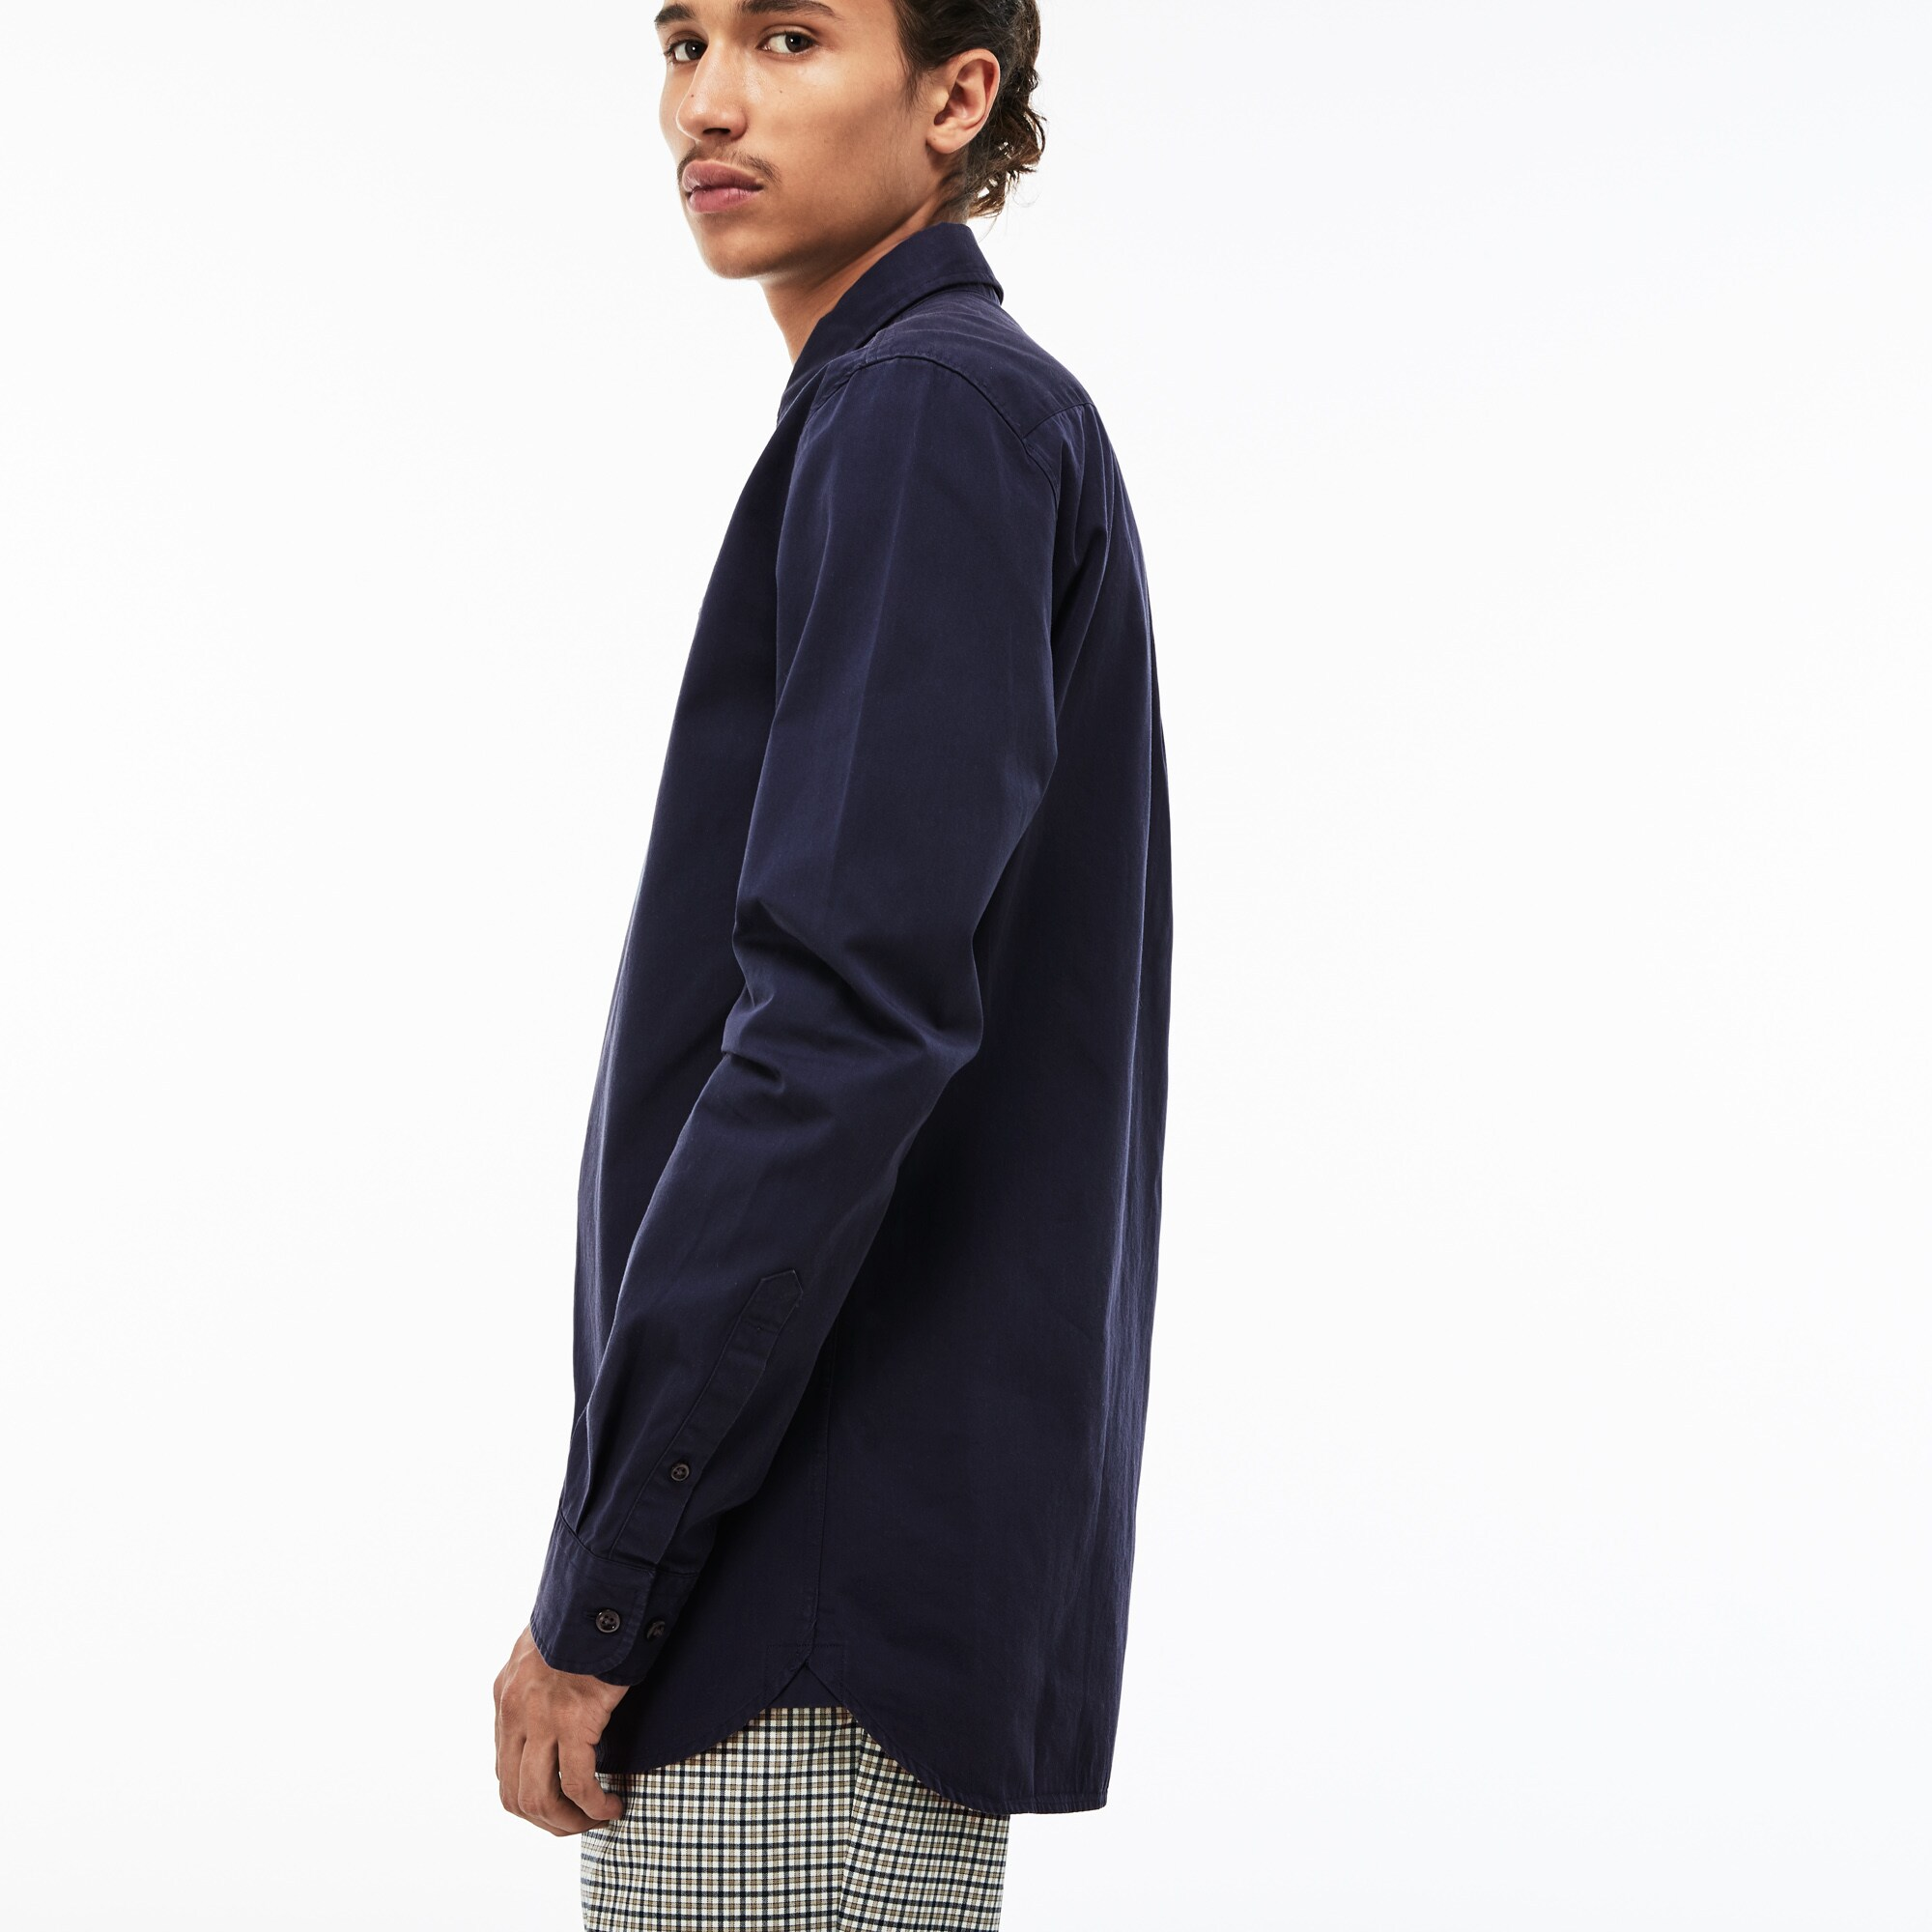 368f68db62 Men's Lacoste LIVE Skinny Fit Cotton Poplin Shirt